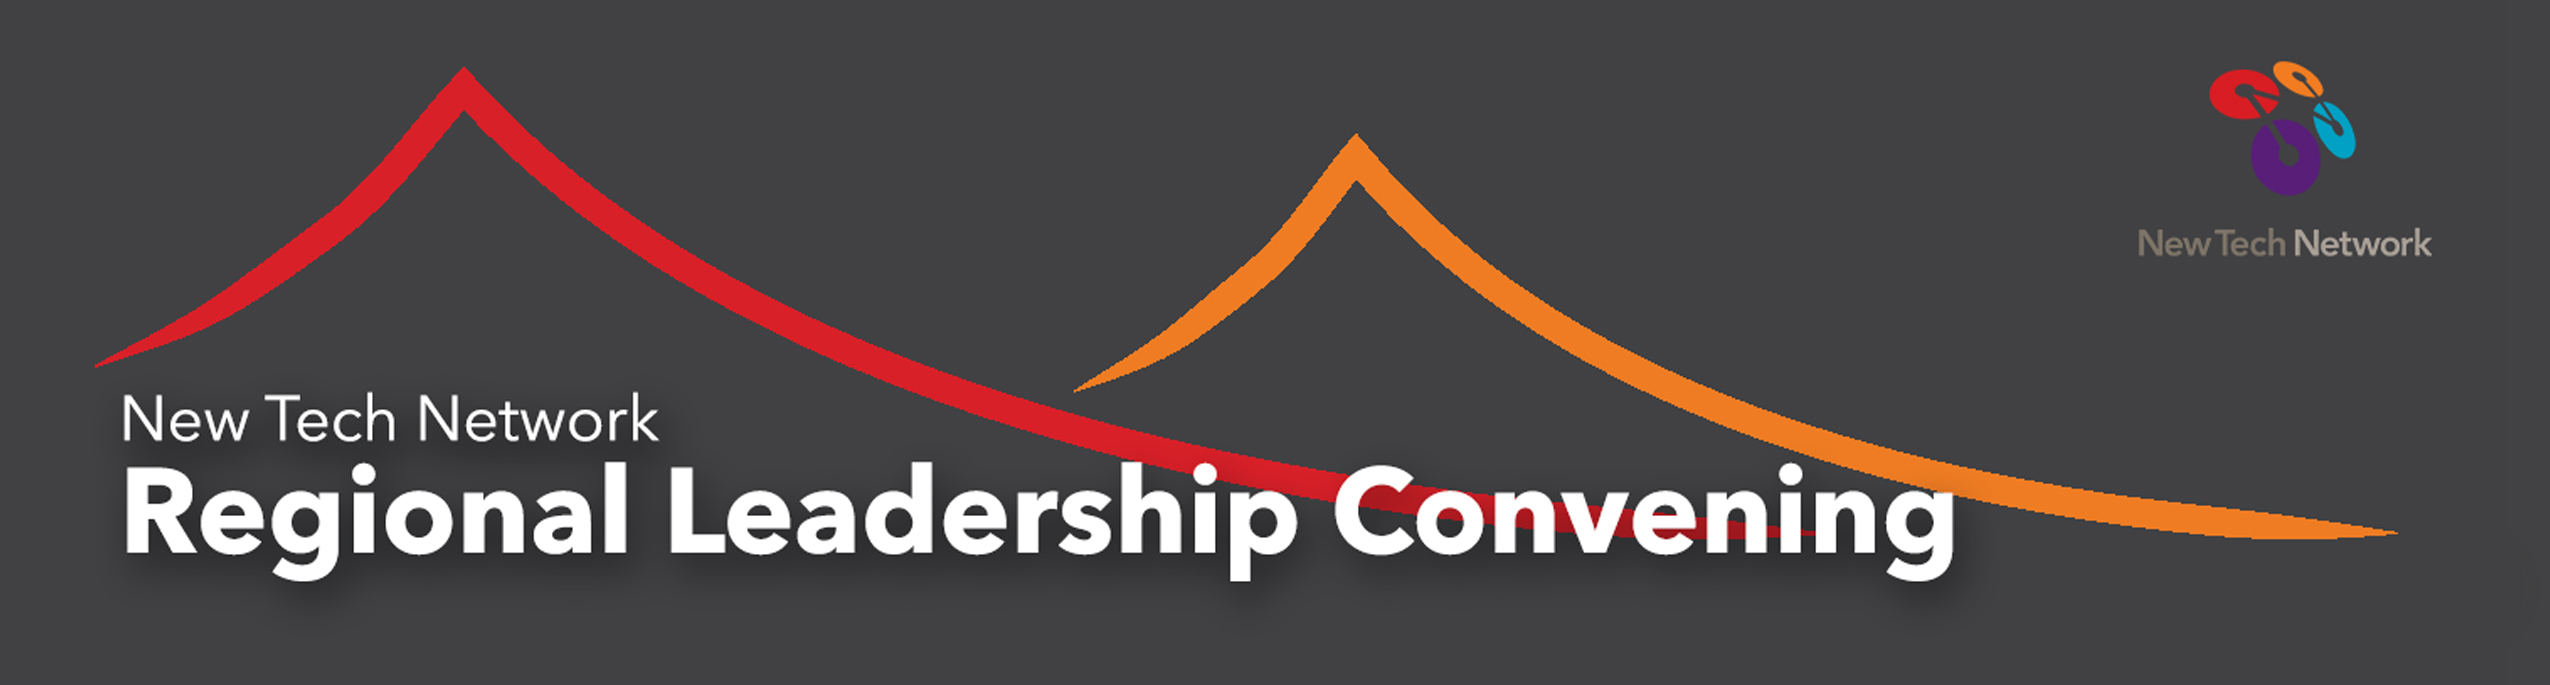 Regional Leadership Convening - Michigan